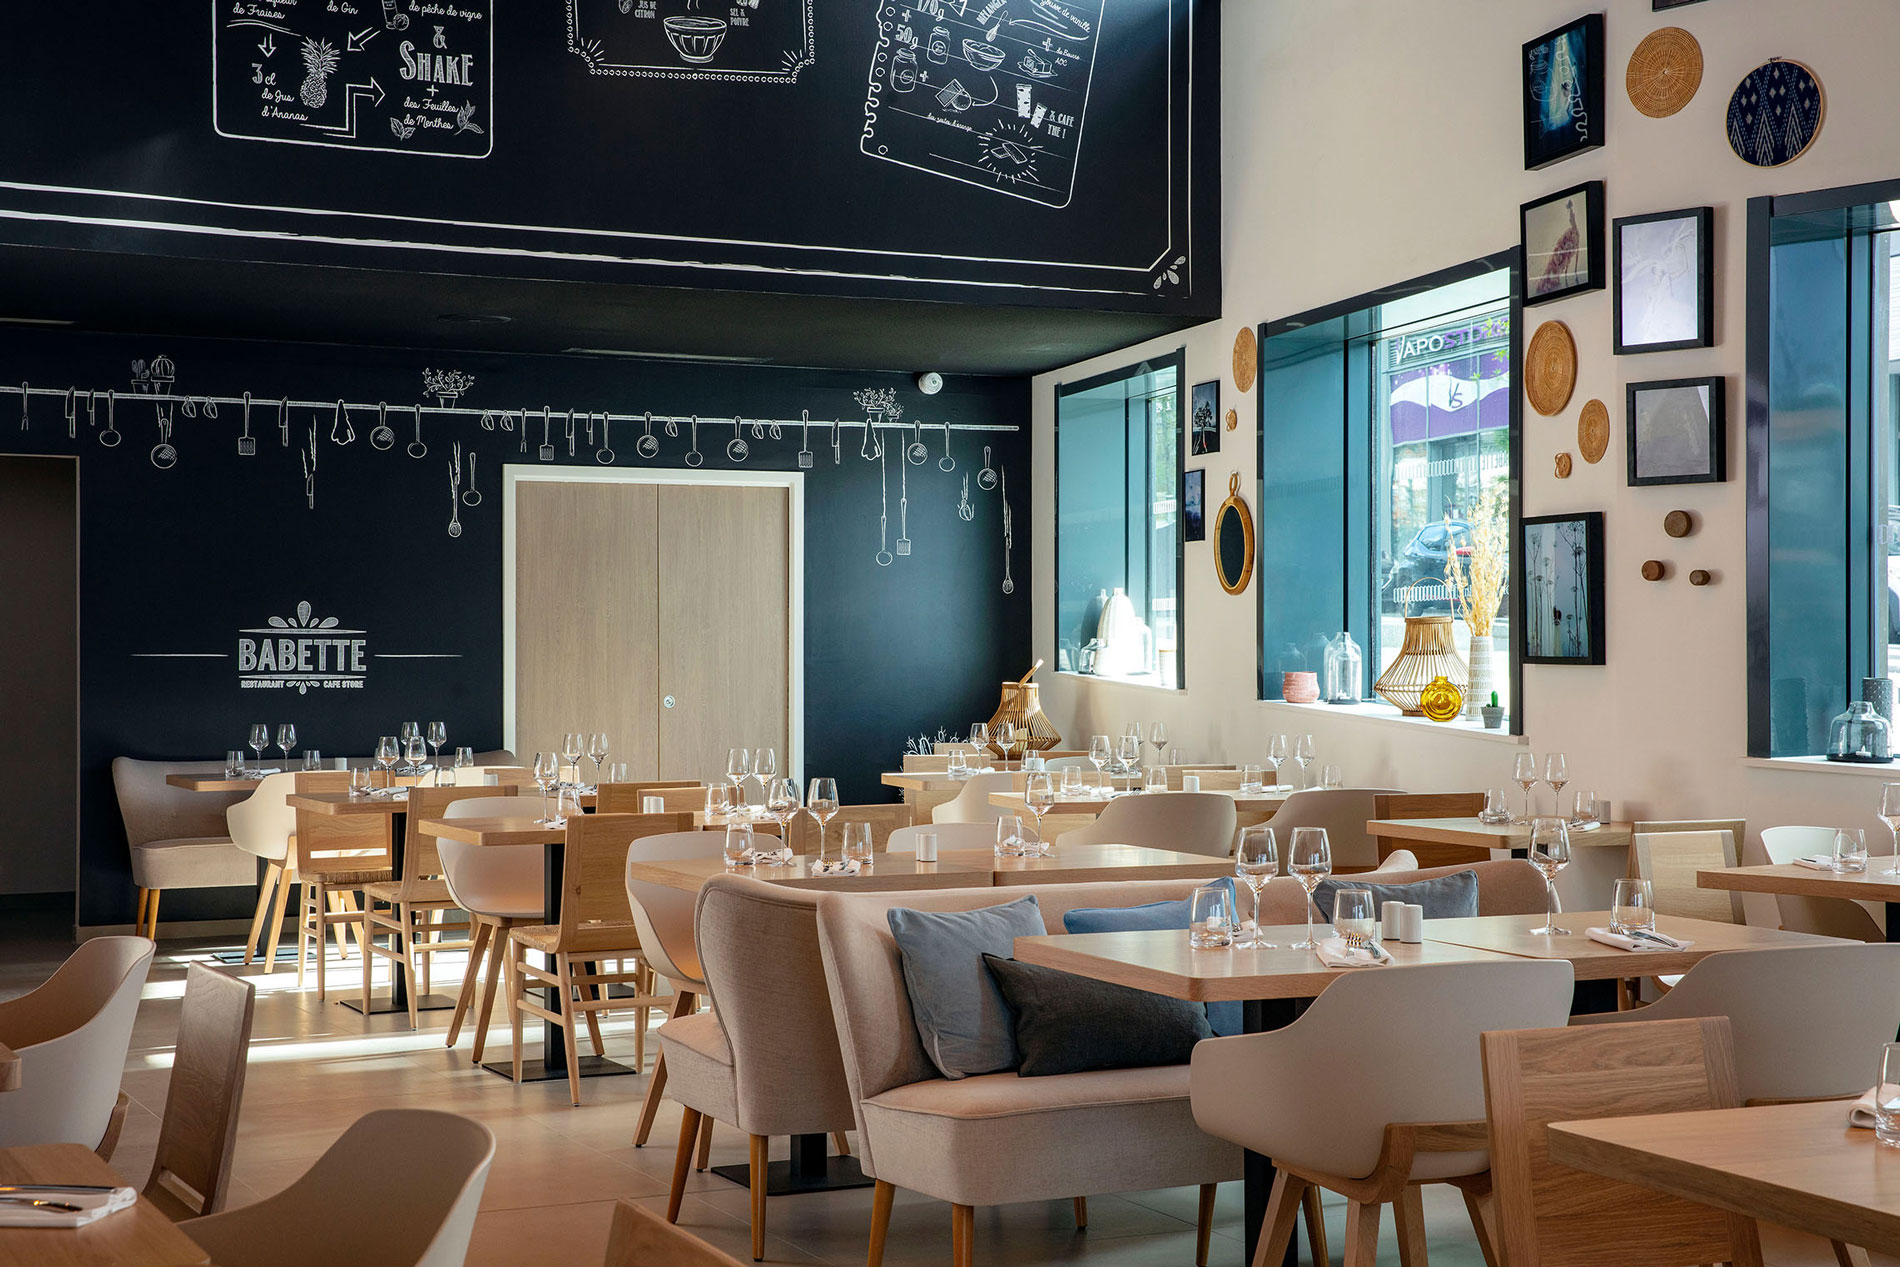 babette-conceptstore-massy-salle-restaurant-opti